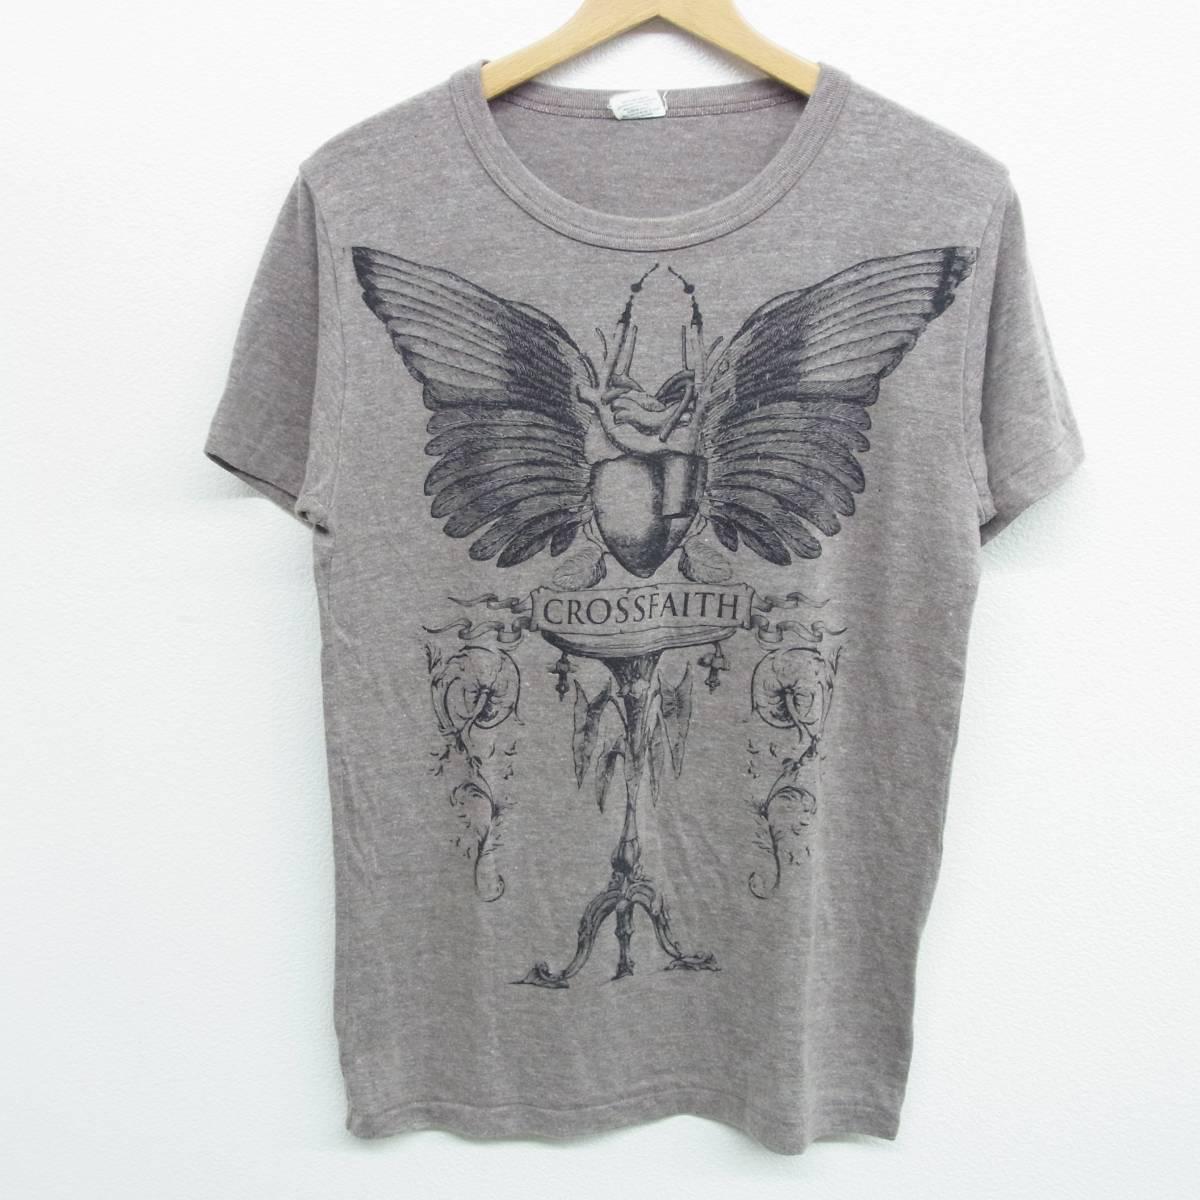 CROSSFAITH クロスフェイス Tシャツ M ブラウン PROMISE